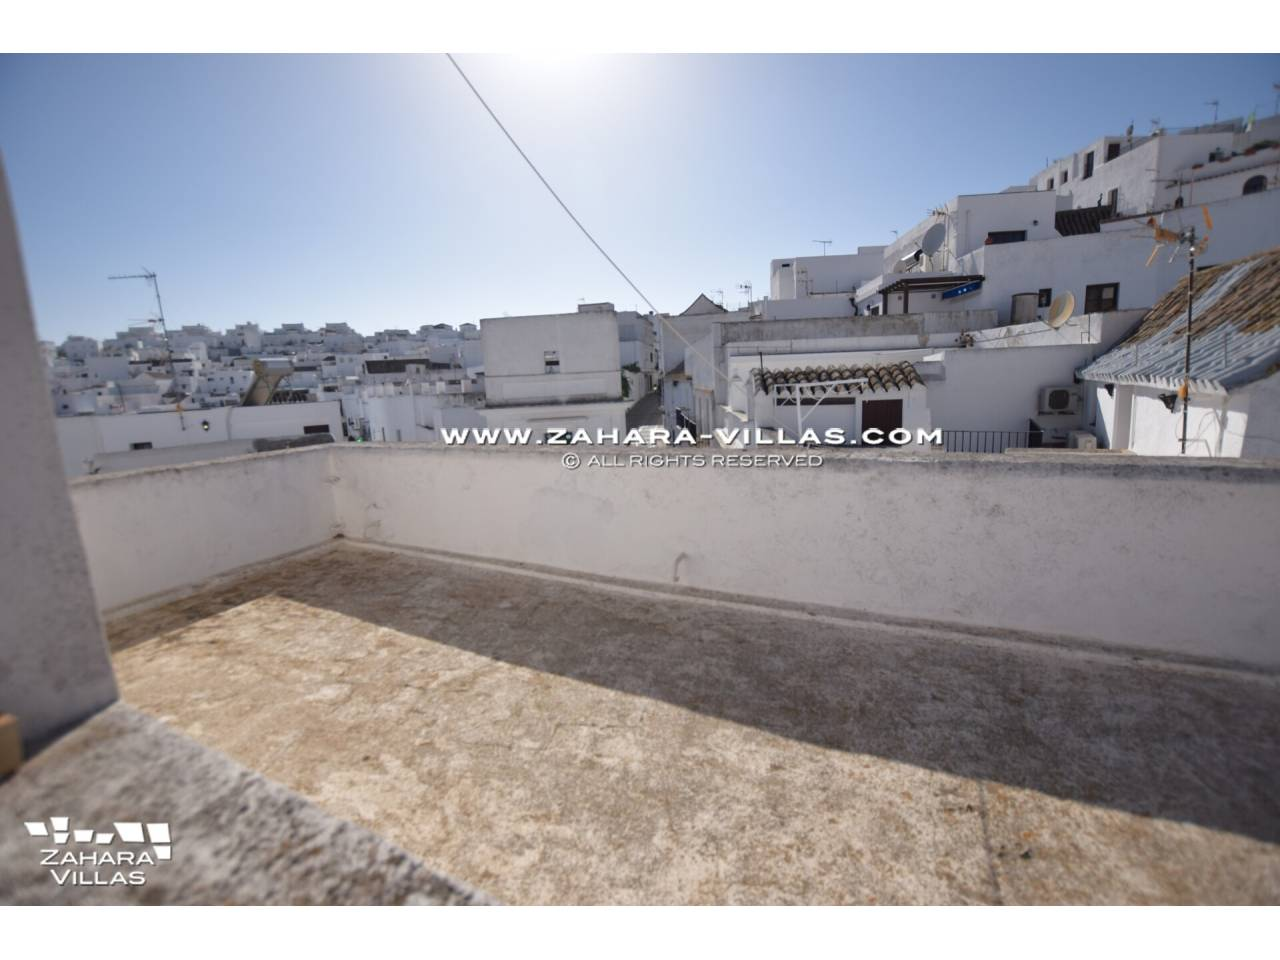 Imagen 2 de House for sale located in pedestrian street of Vejer de la Frontera